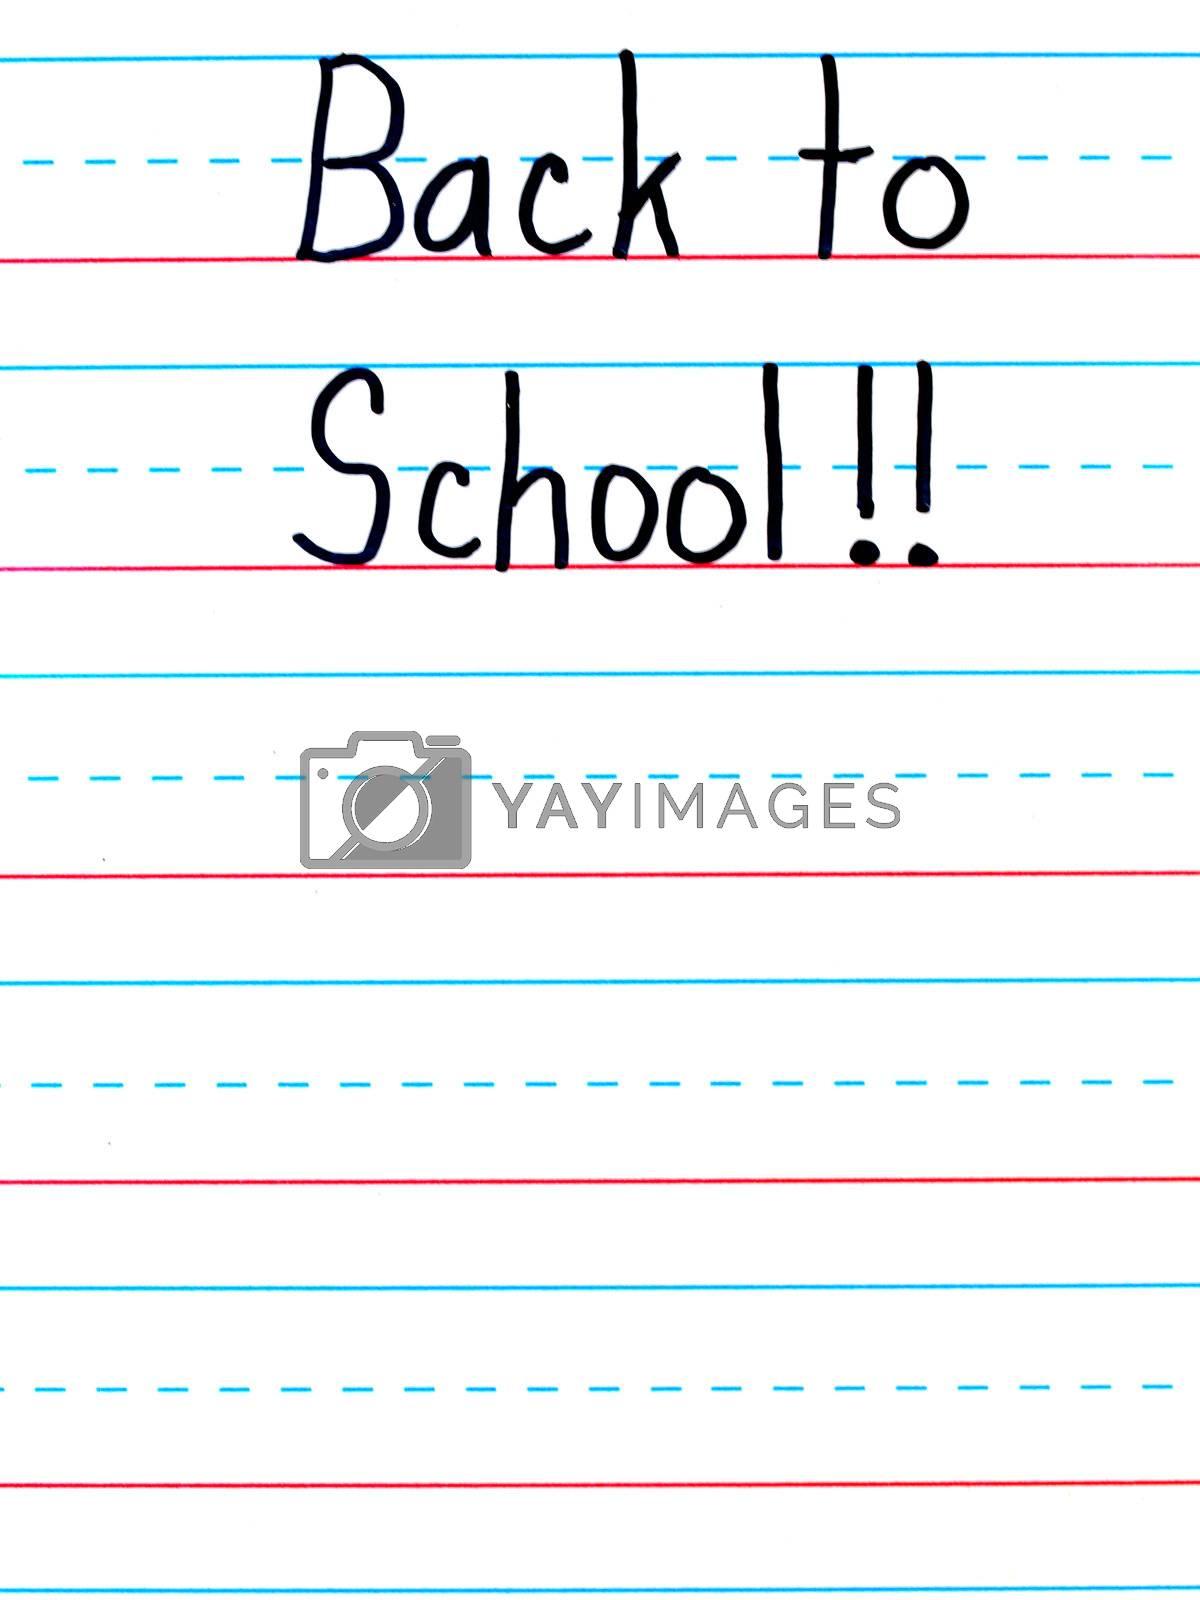 Back to School Written on a Lined Dry Erase Board